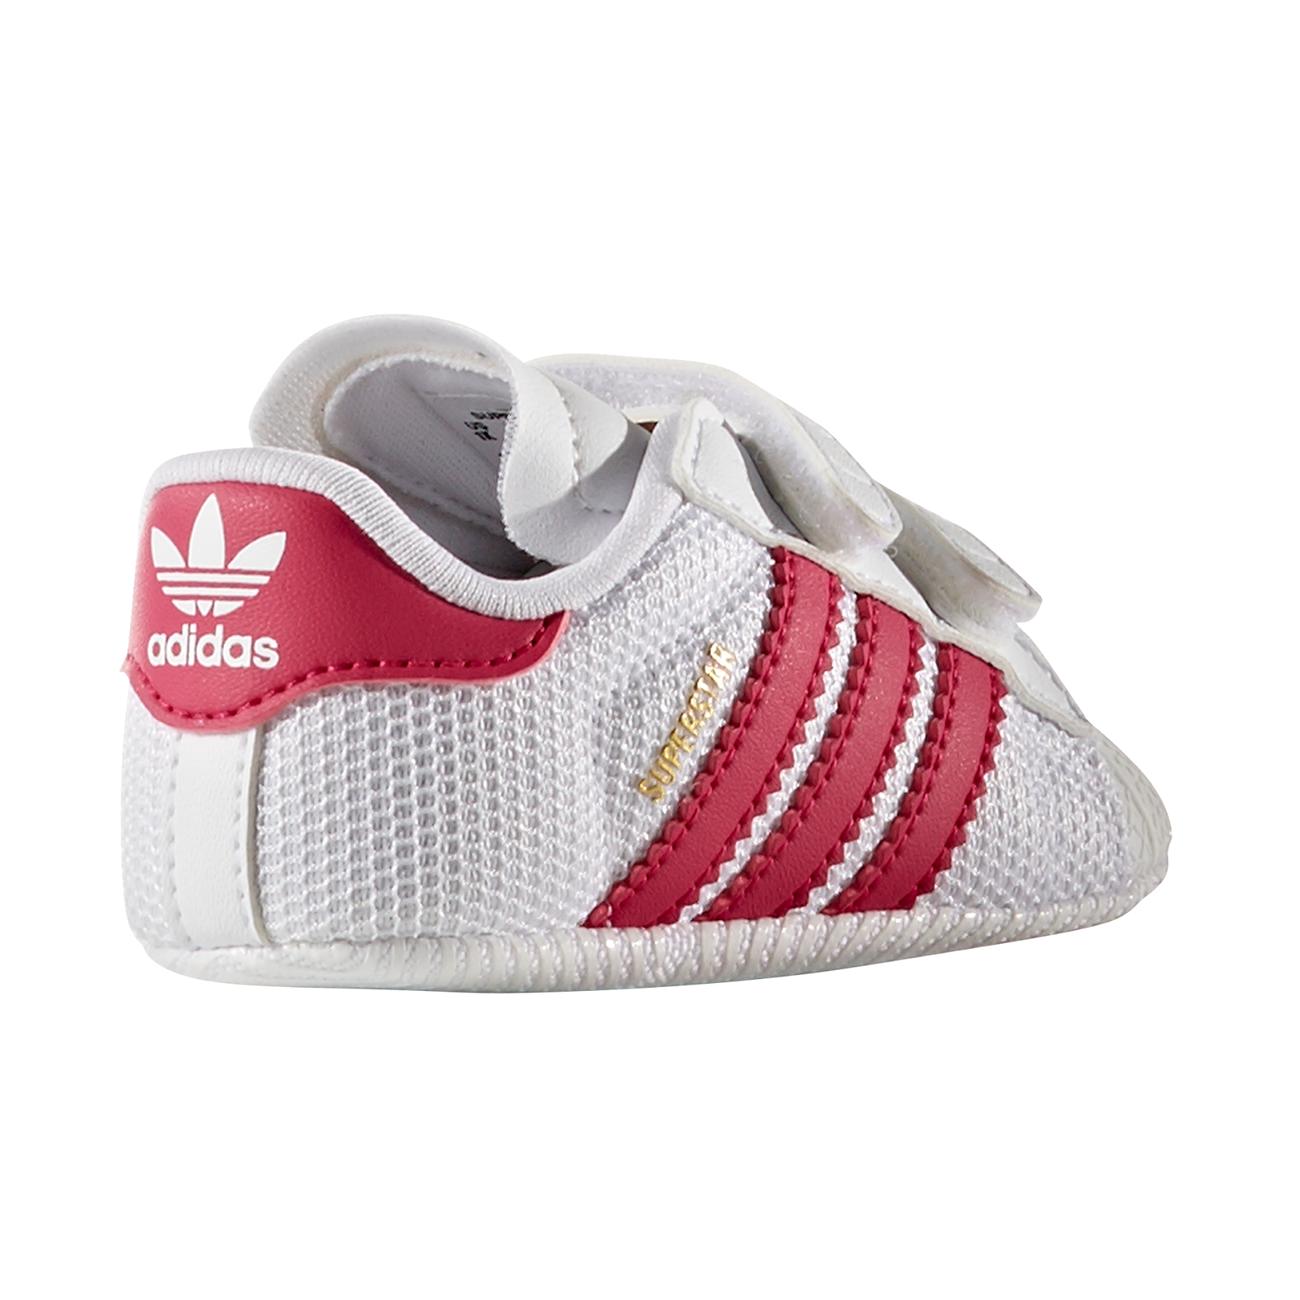 4eaaec28492 adidas Superstar Sneakers White/Pink S79917